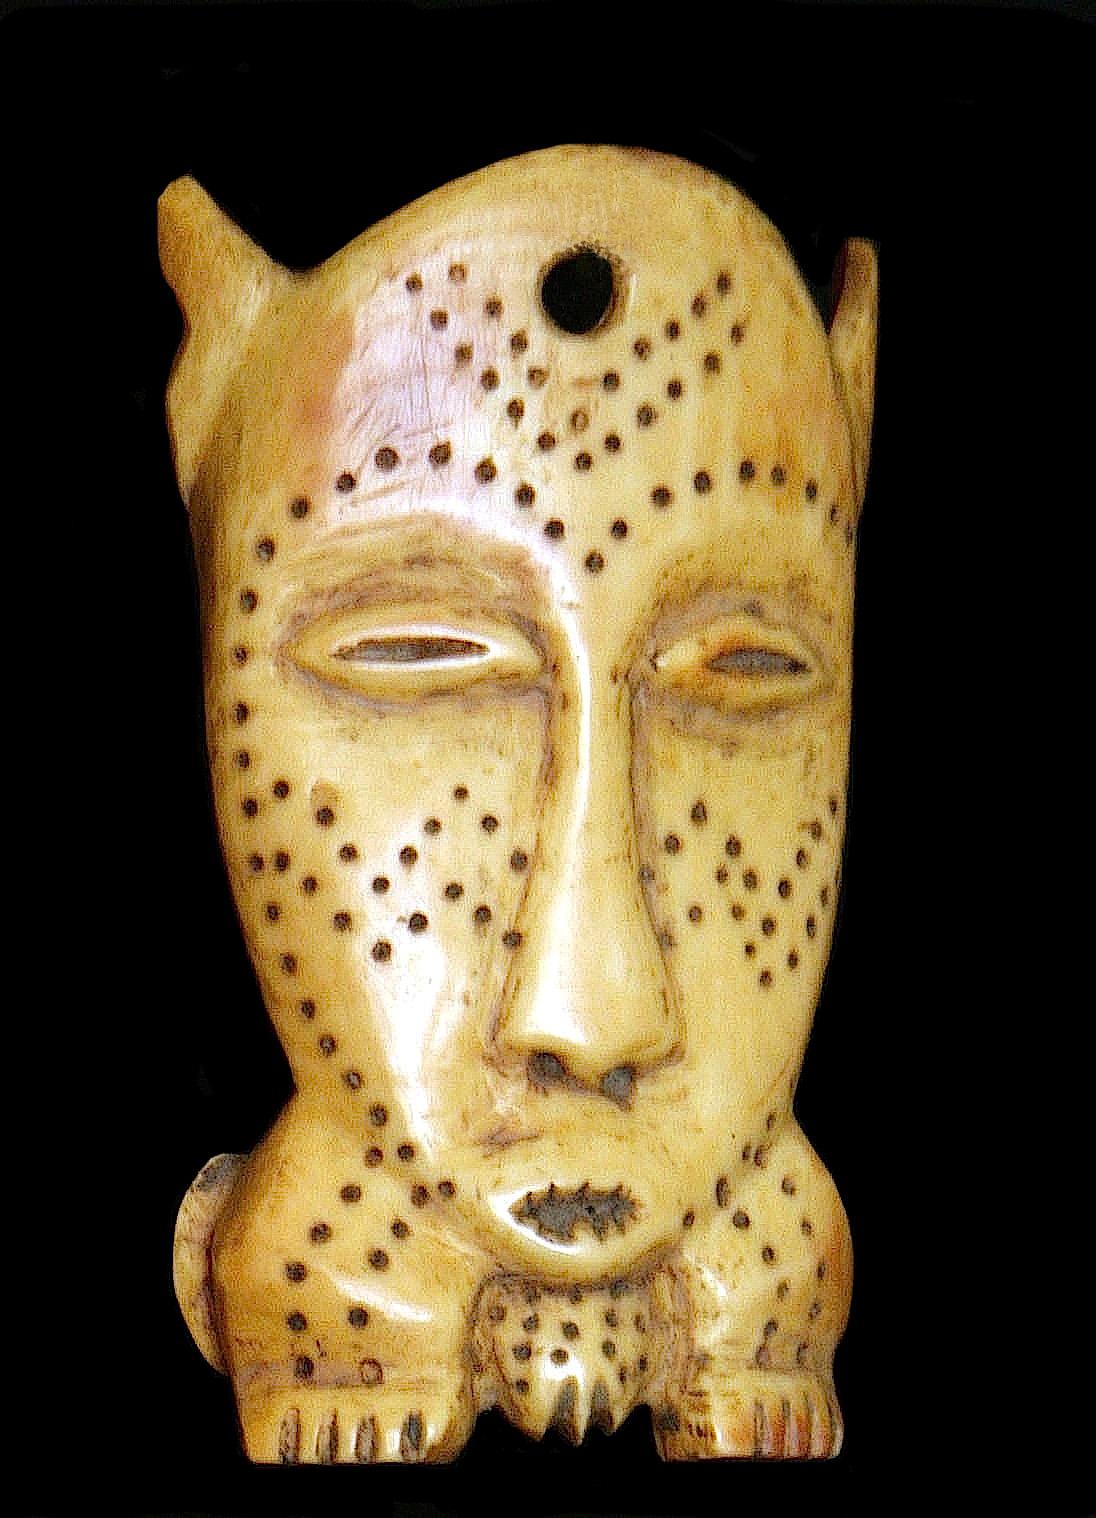 maschera passaporto Lega, Congo